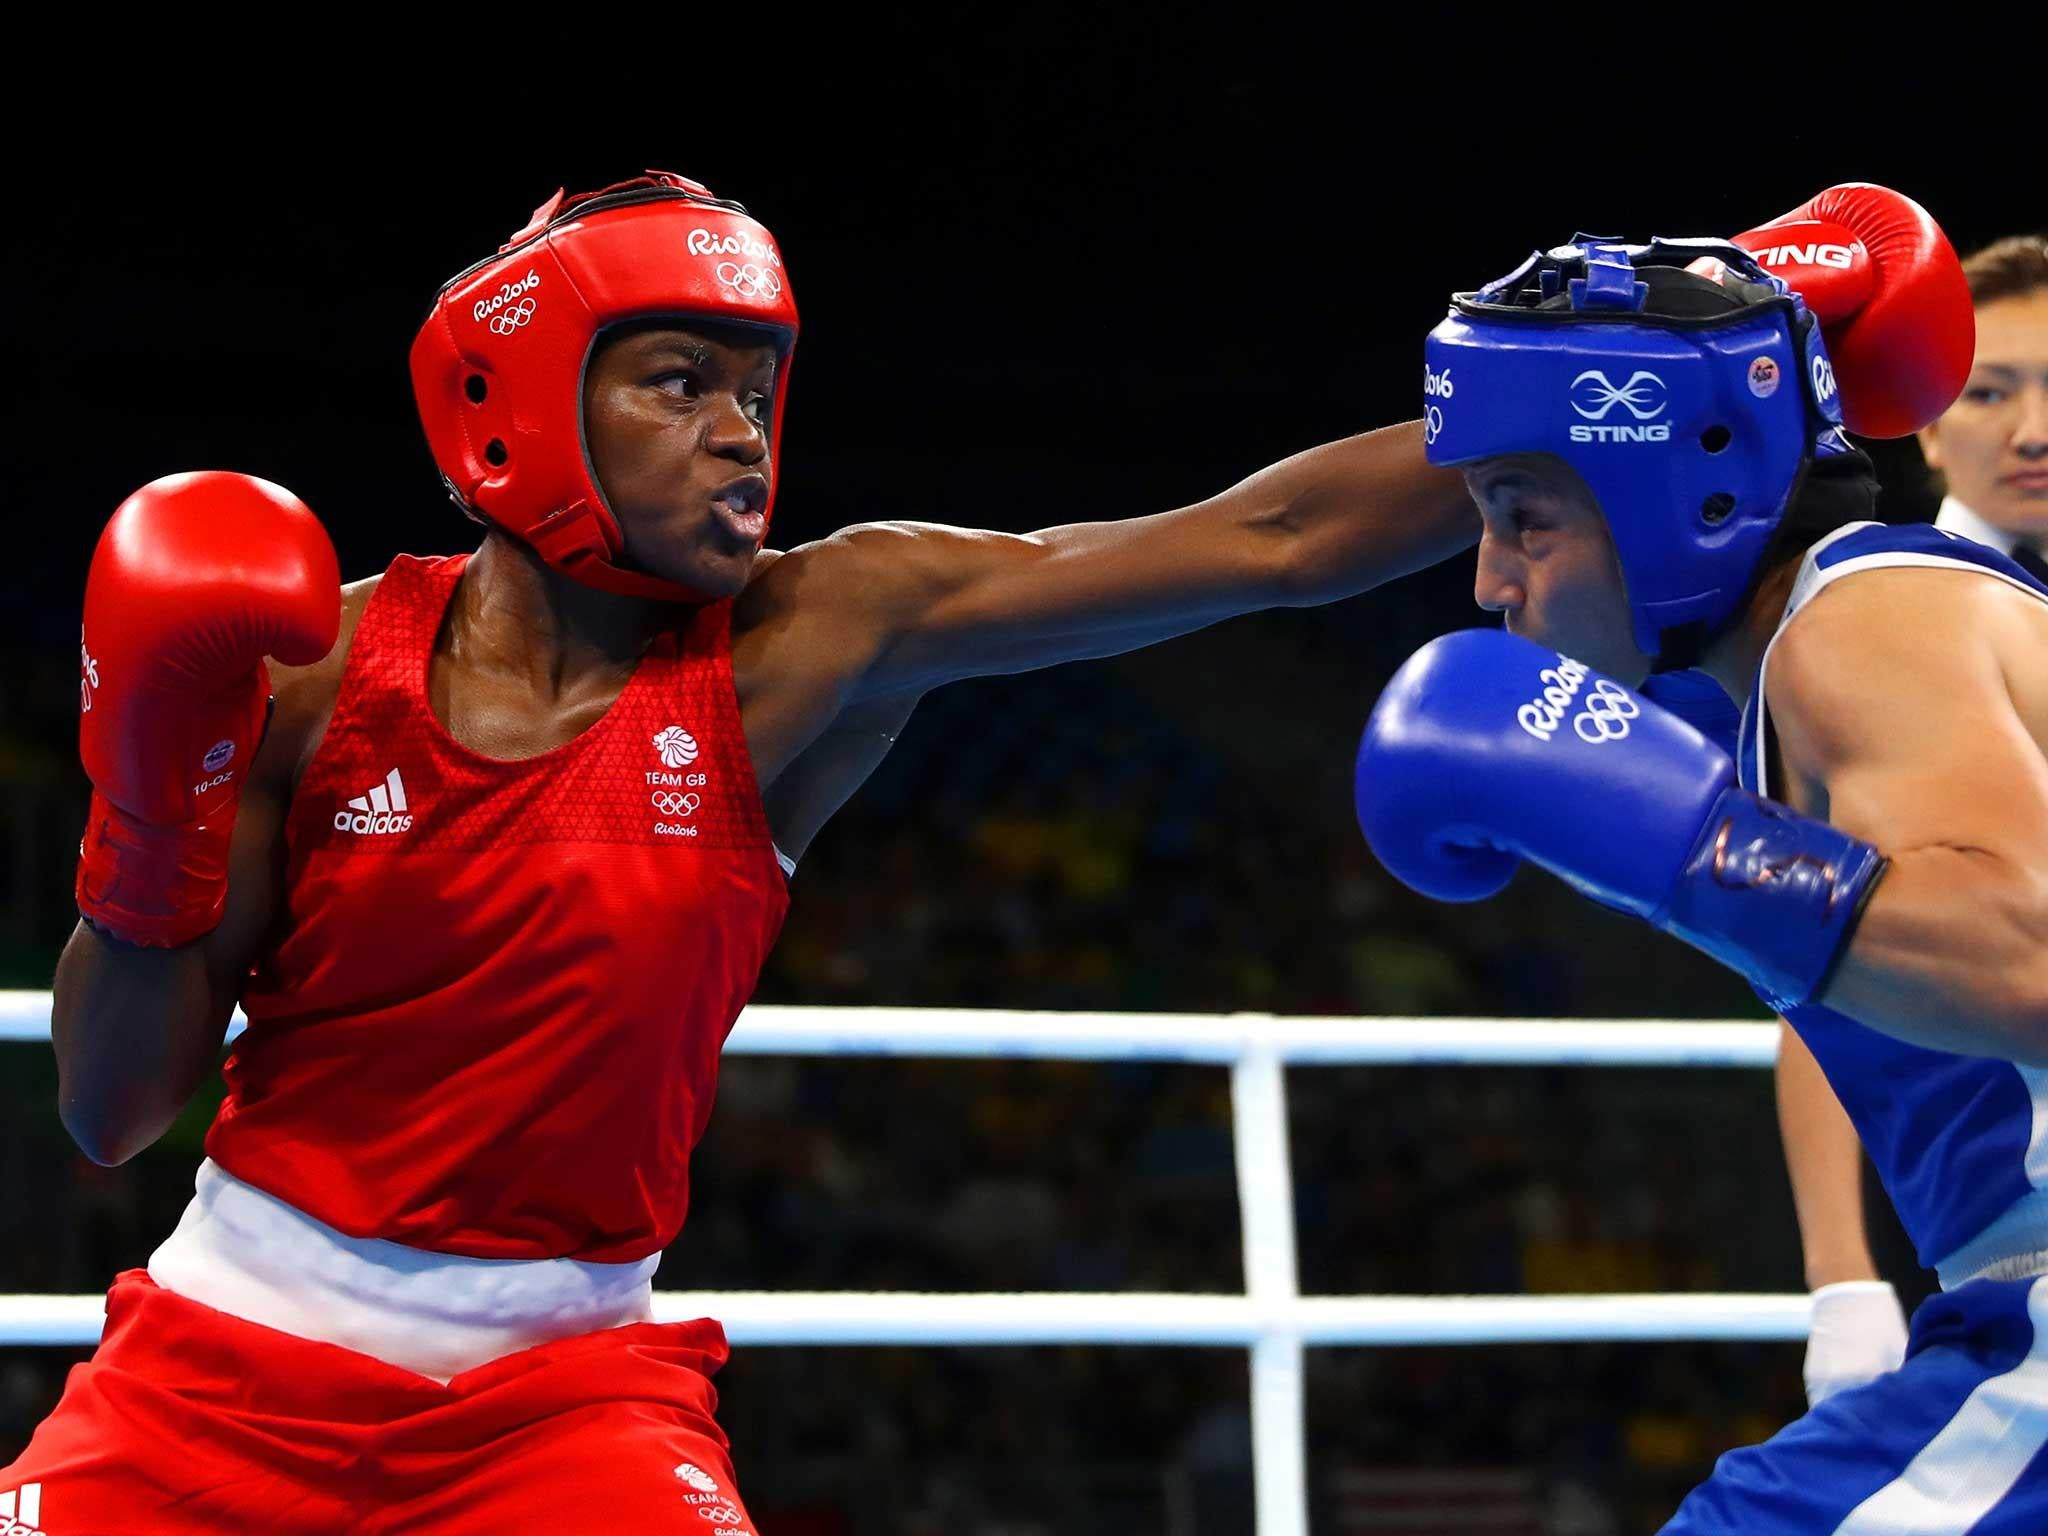 British boxer brings back gold